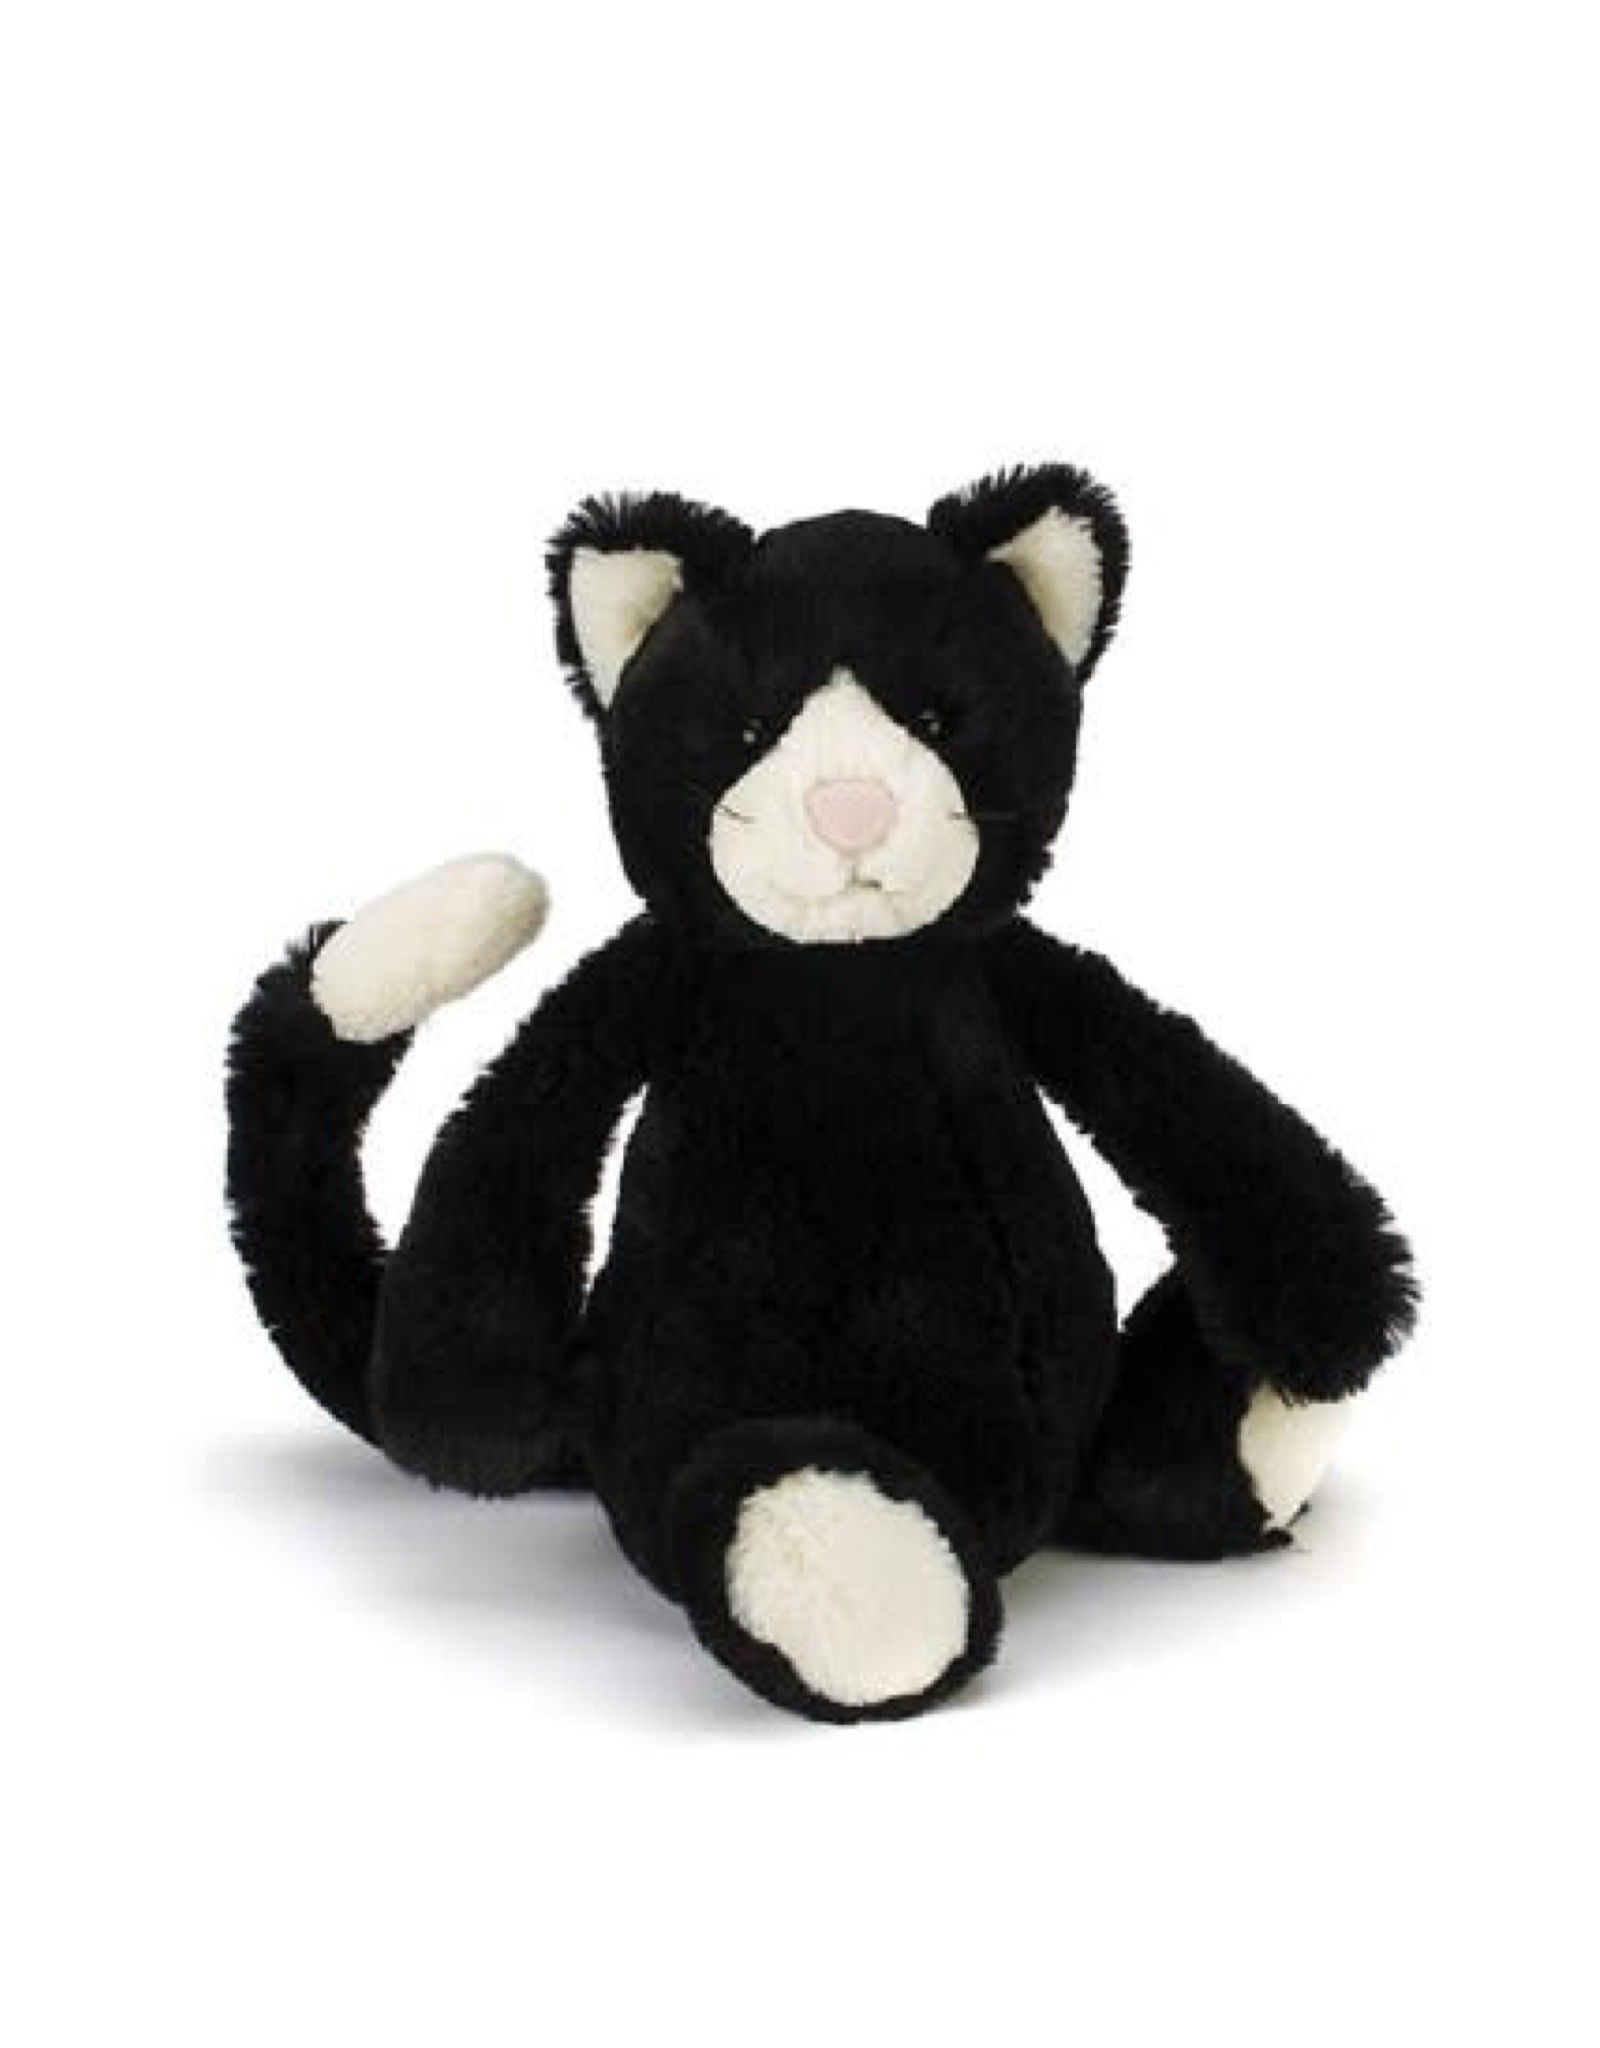 Jellycat Black and White Kitten Medium